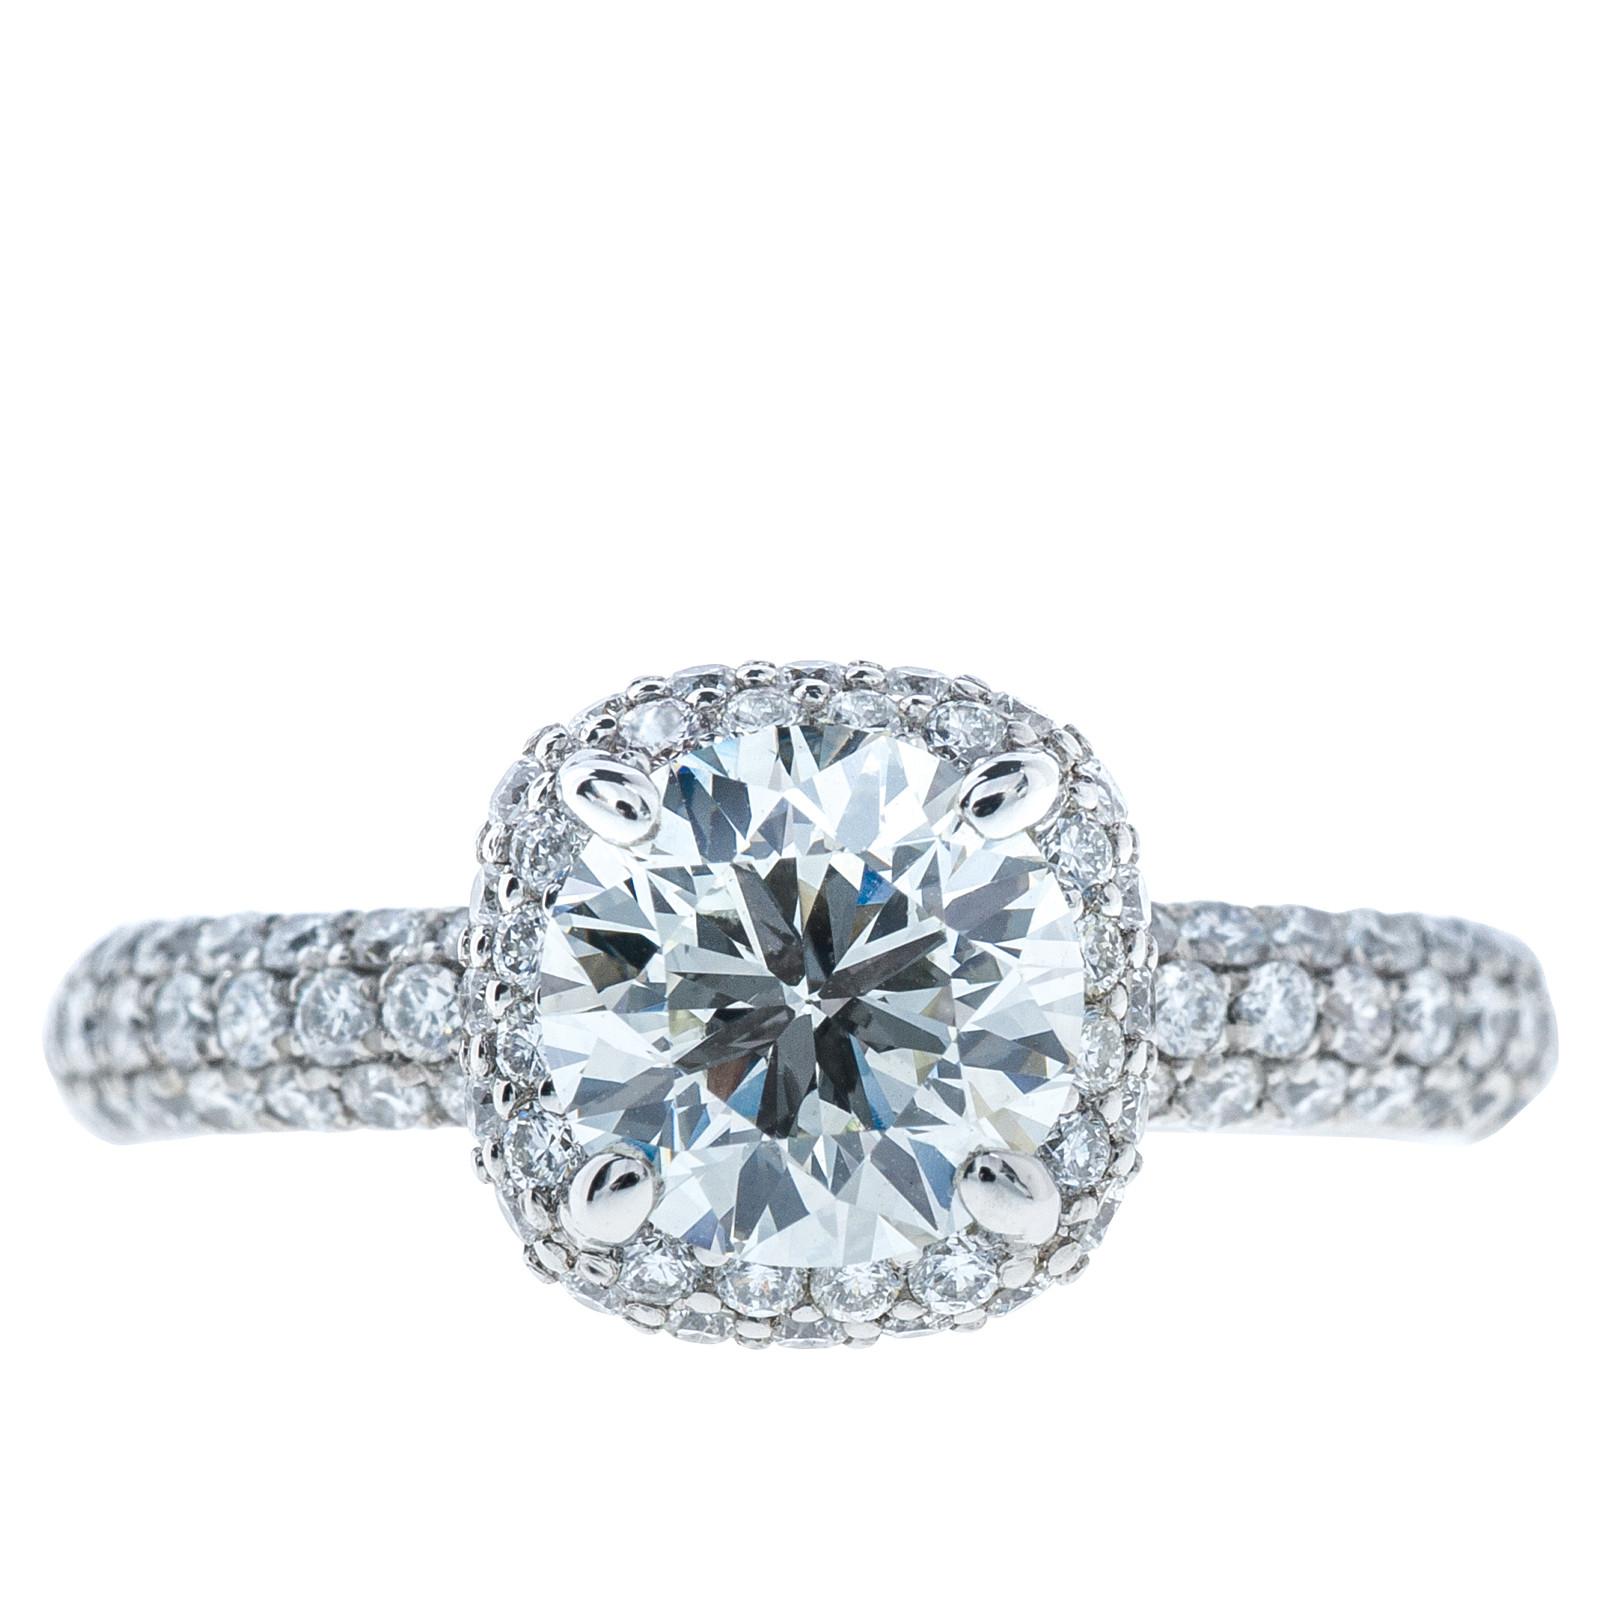 Vintage 2.07 CTW Diamond Engagement Ring